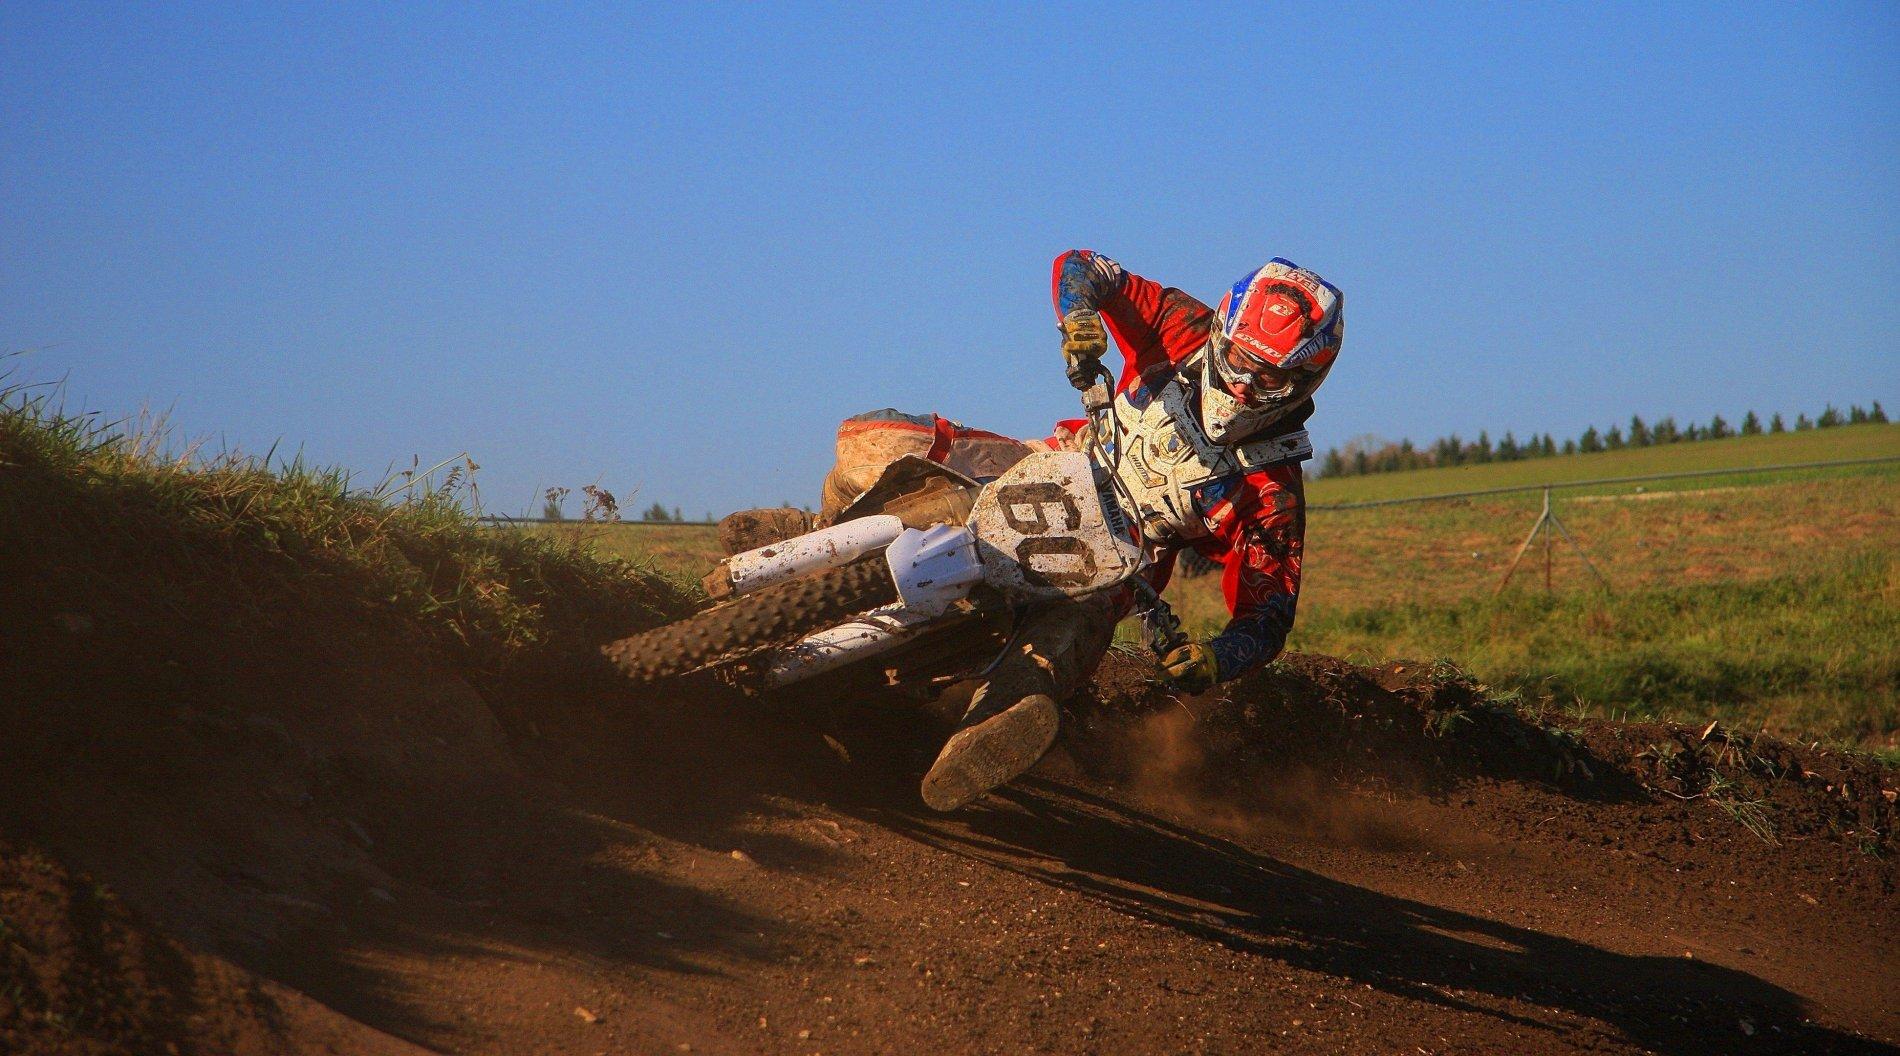 Motocross in Obernheim